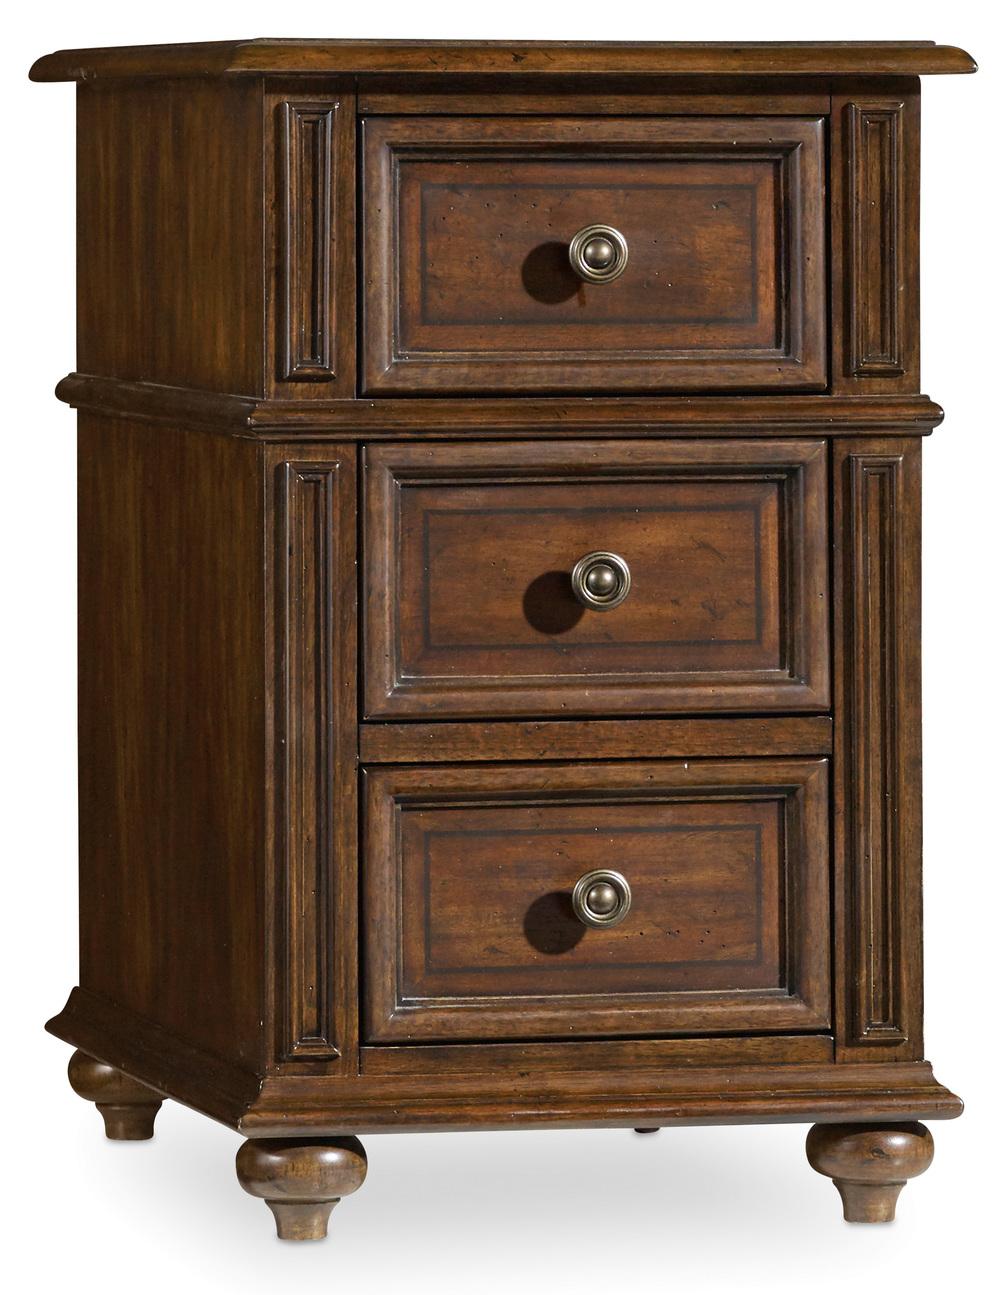 Hooker Furniture - Leesburg Chairside Chest